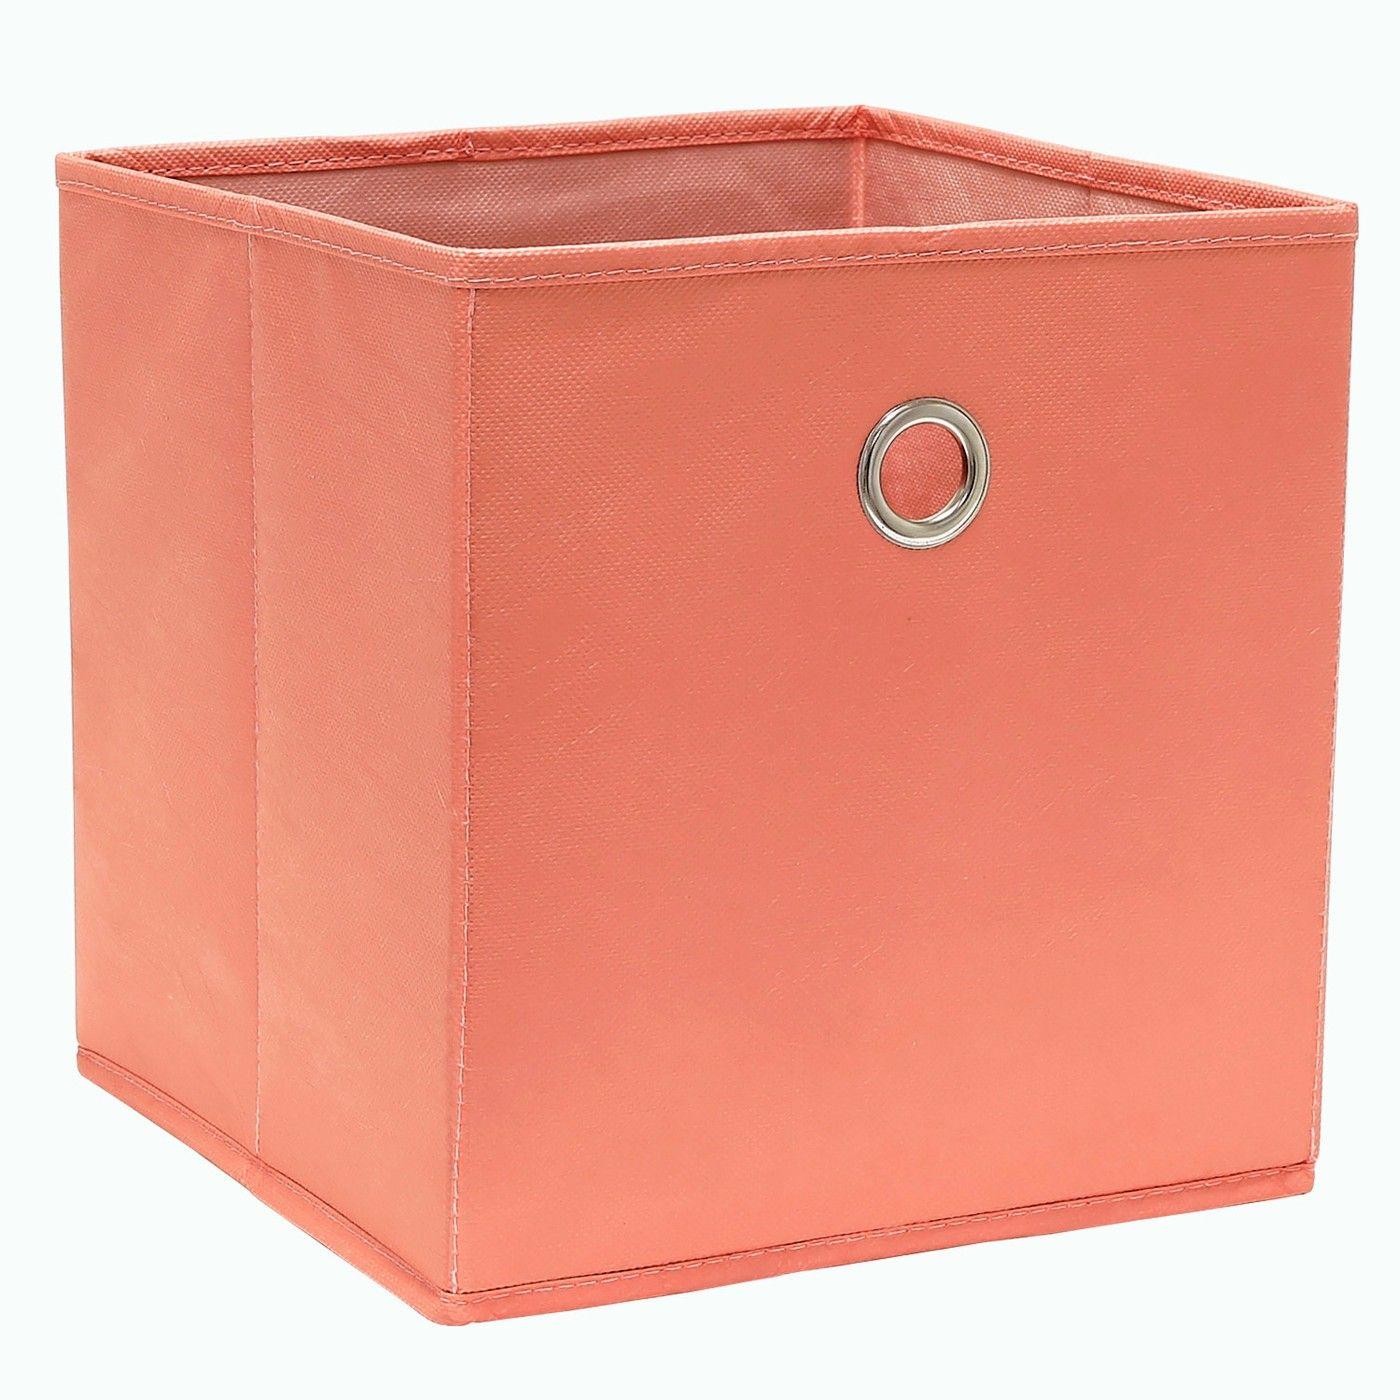 Fabric Cube Storage Bin 11 Room Essentials Cube Storage Bins Cube Storage Fabric Storage Bins